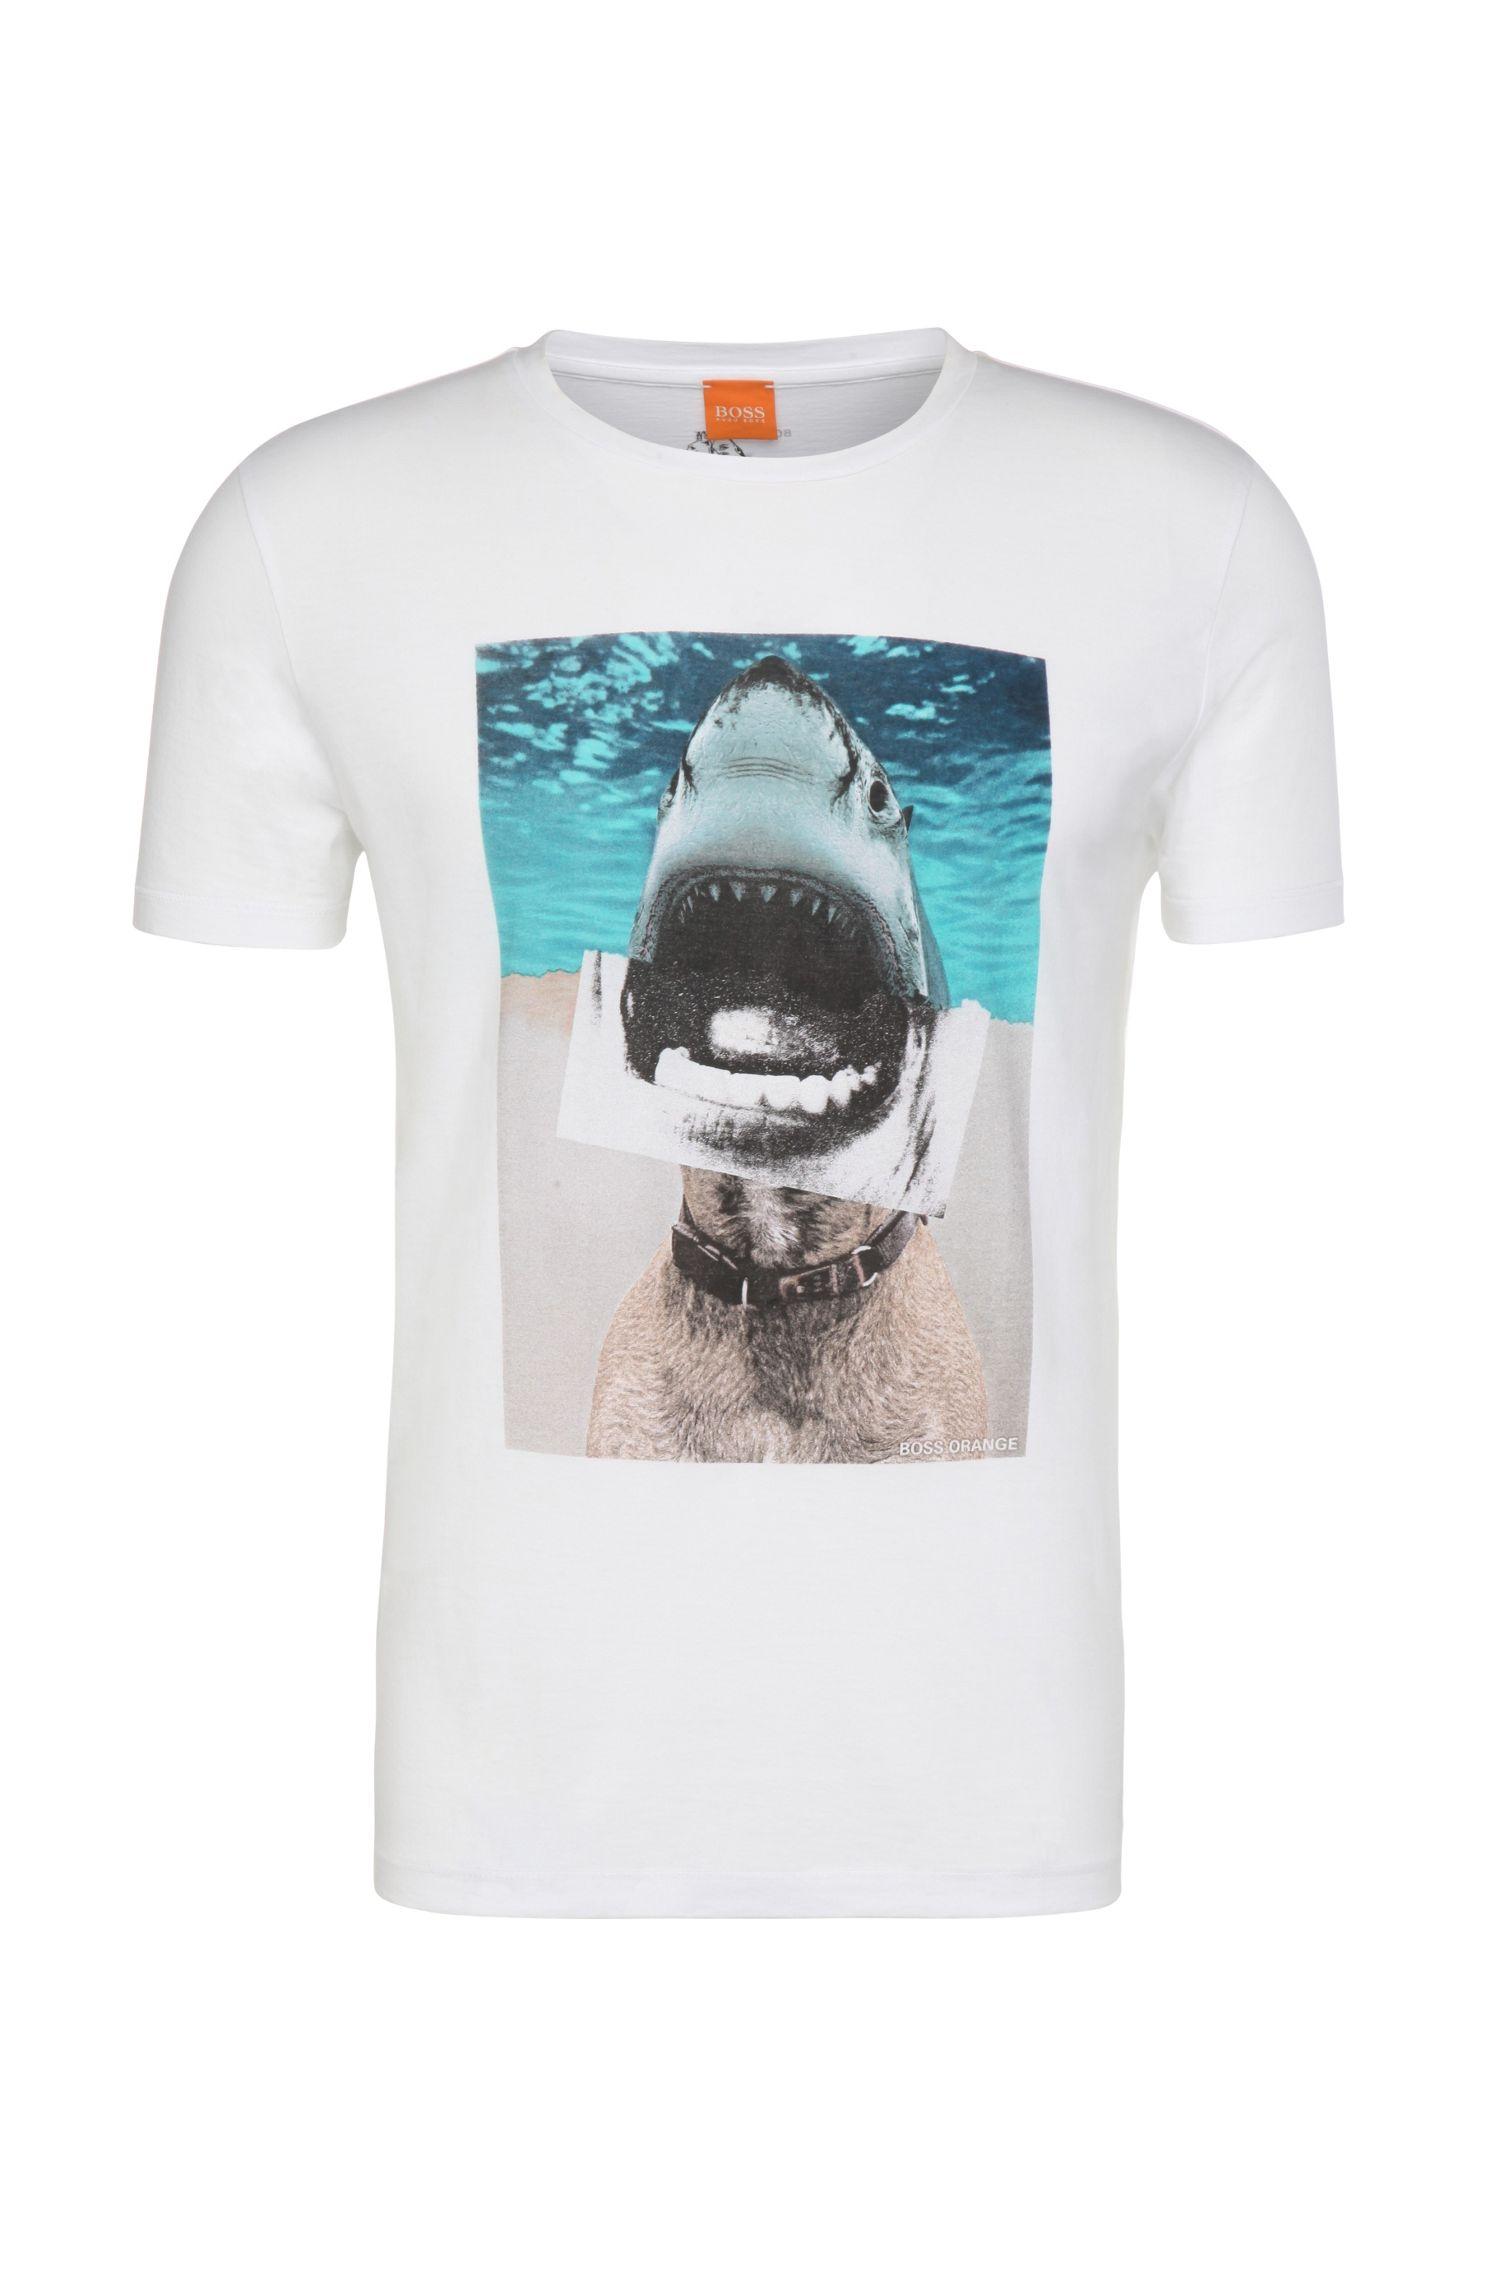 'Treyno' | Cotton Printed T-Shirt